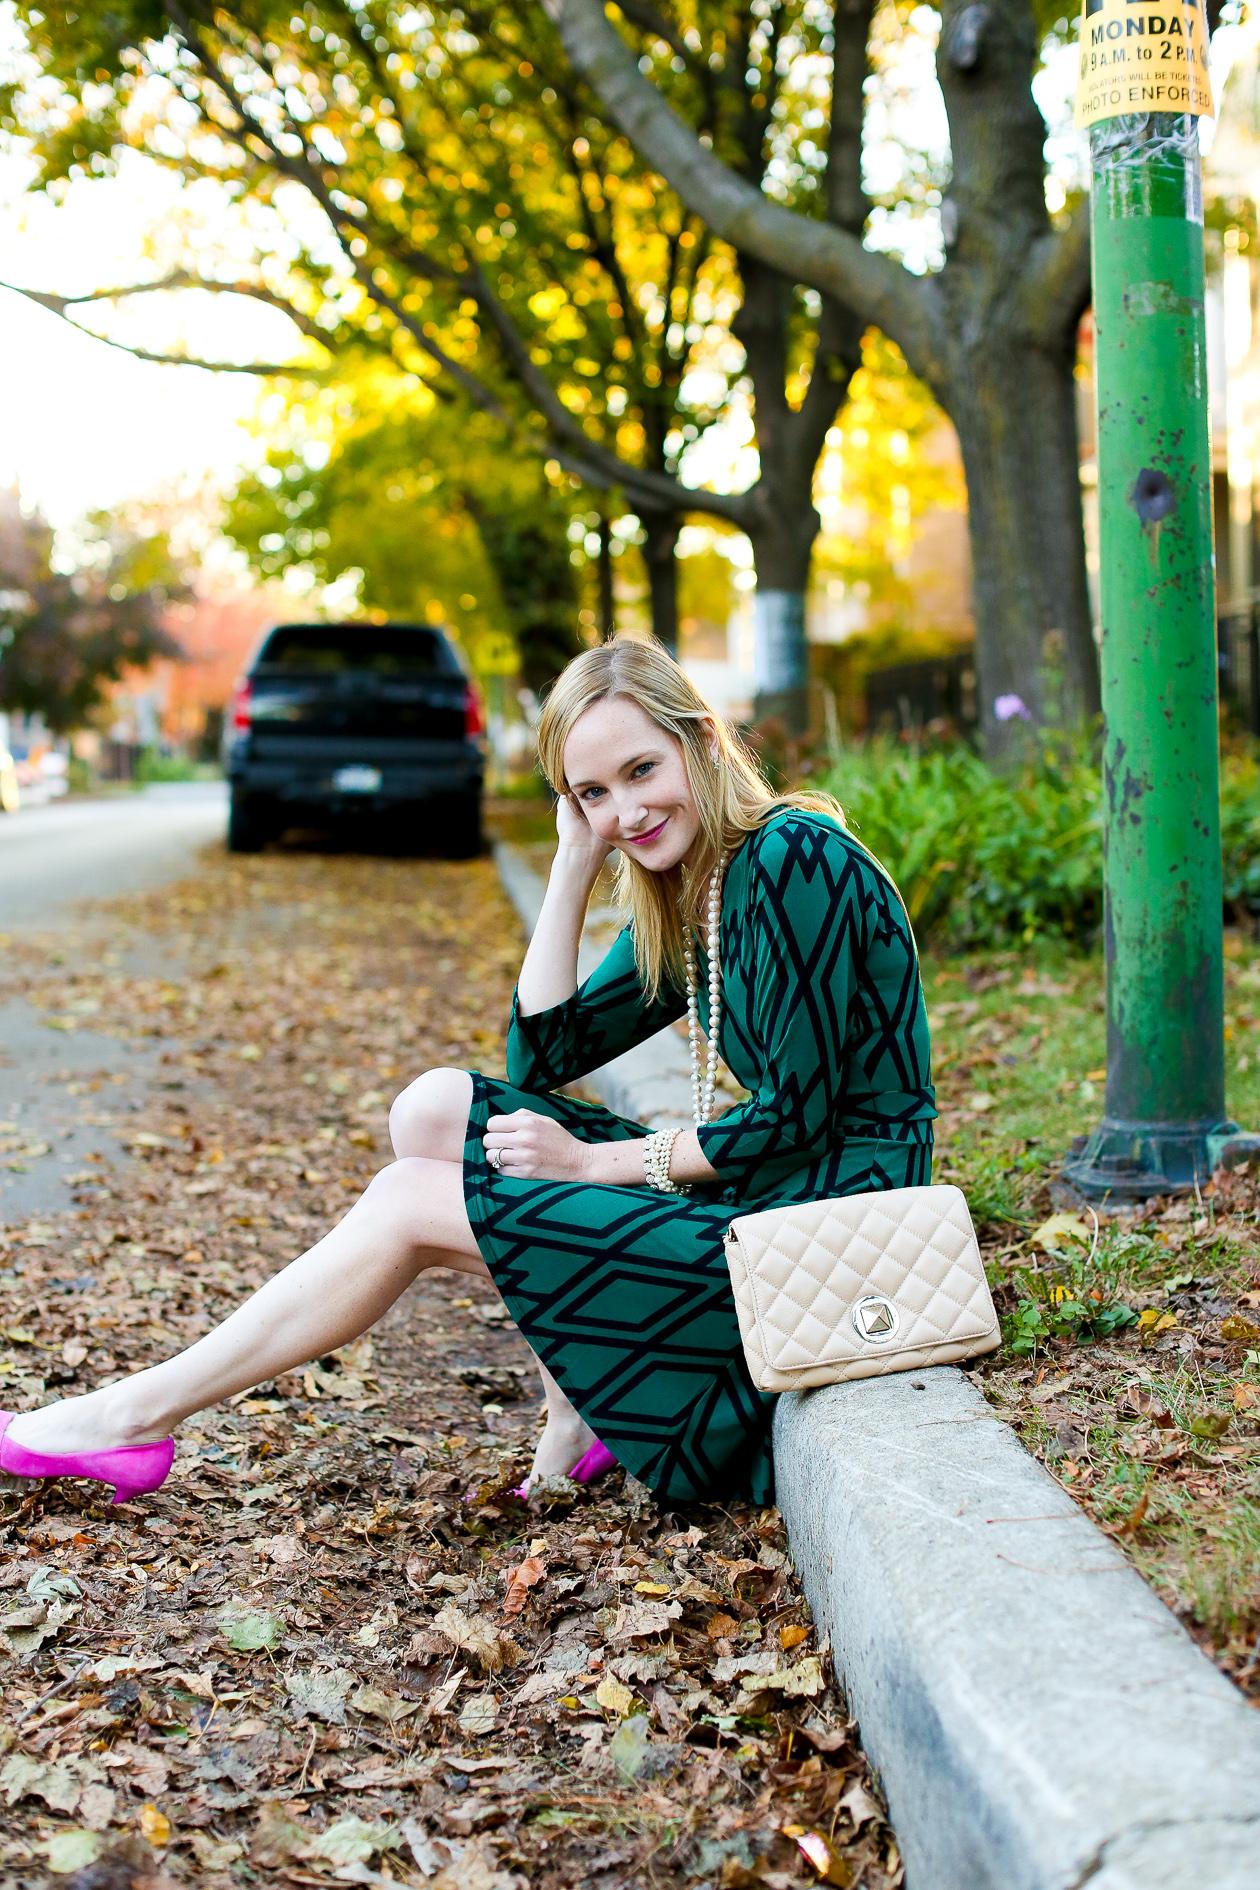 Leota Dress Pink Suede Pumps-39